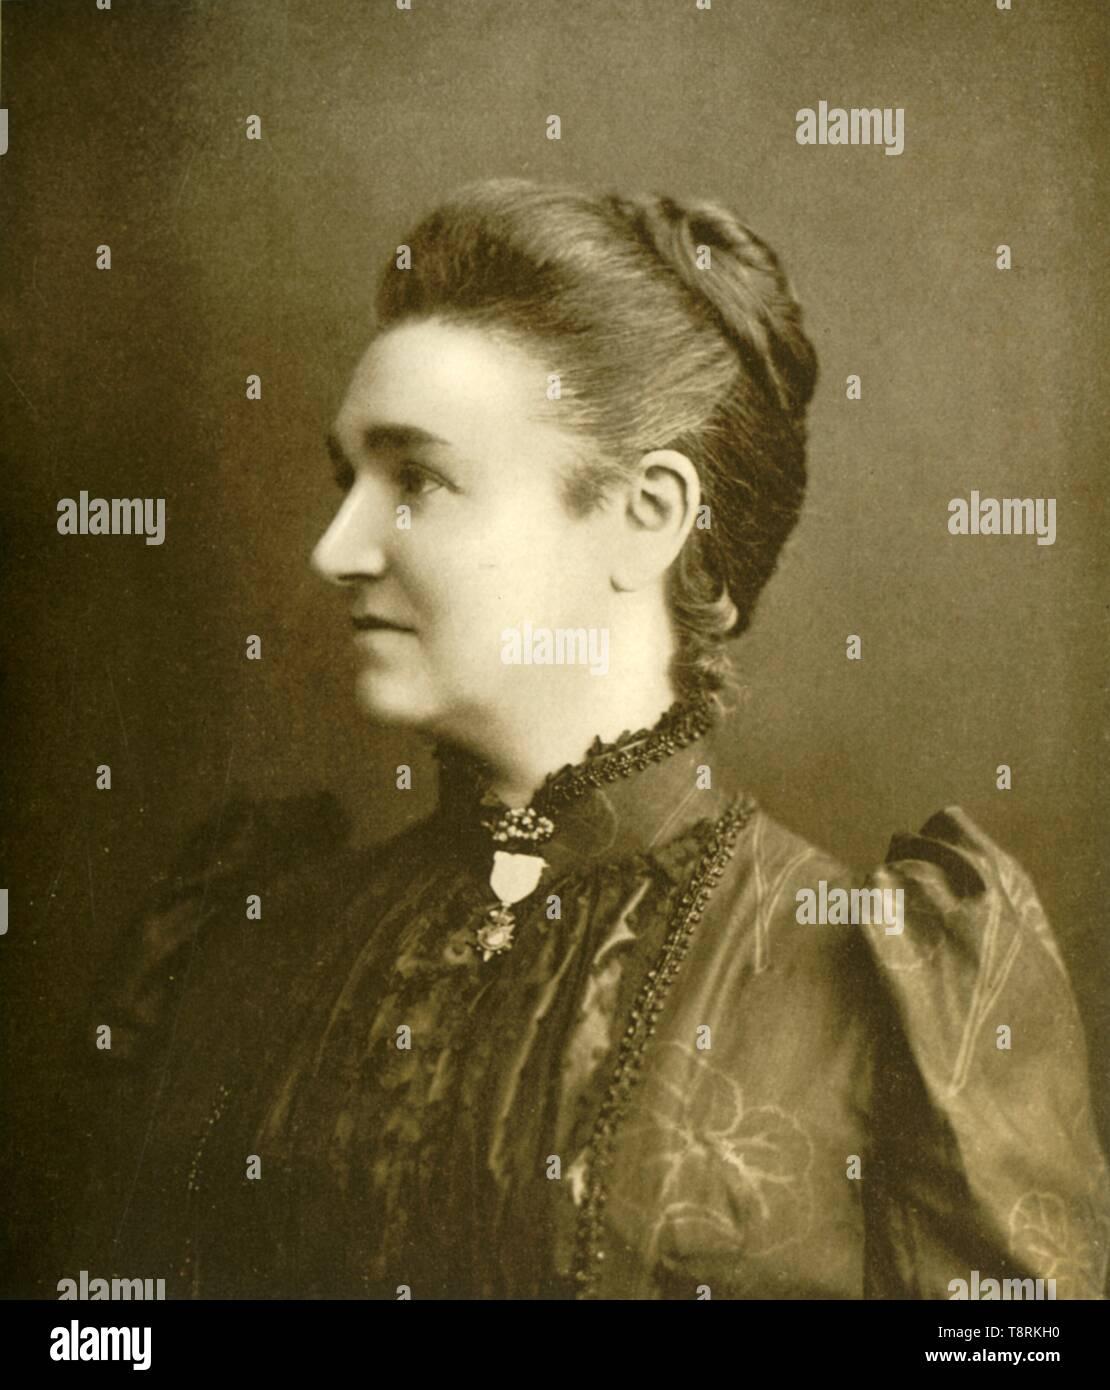 'Lady Roberts of Kandahar', c1889, (1901). Creator: Johnston & Hoffmann. - Stock Image